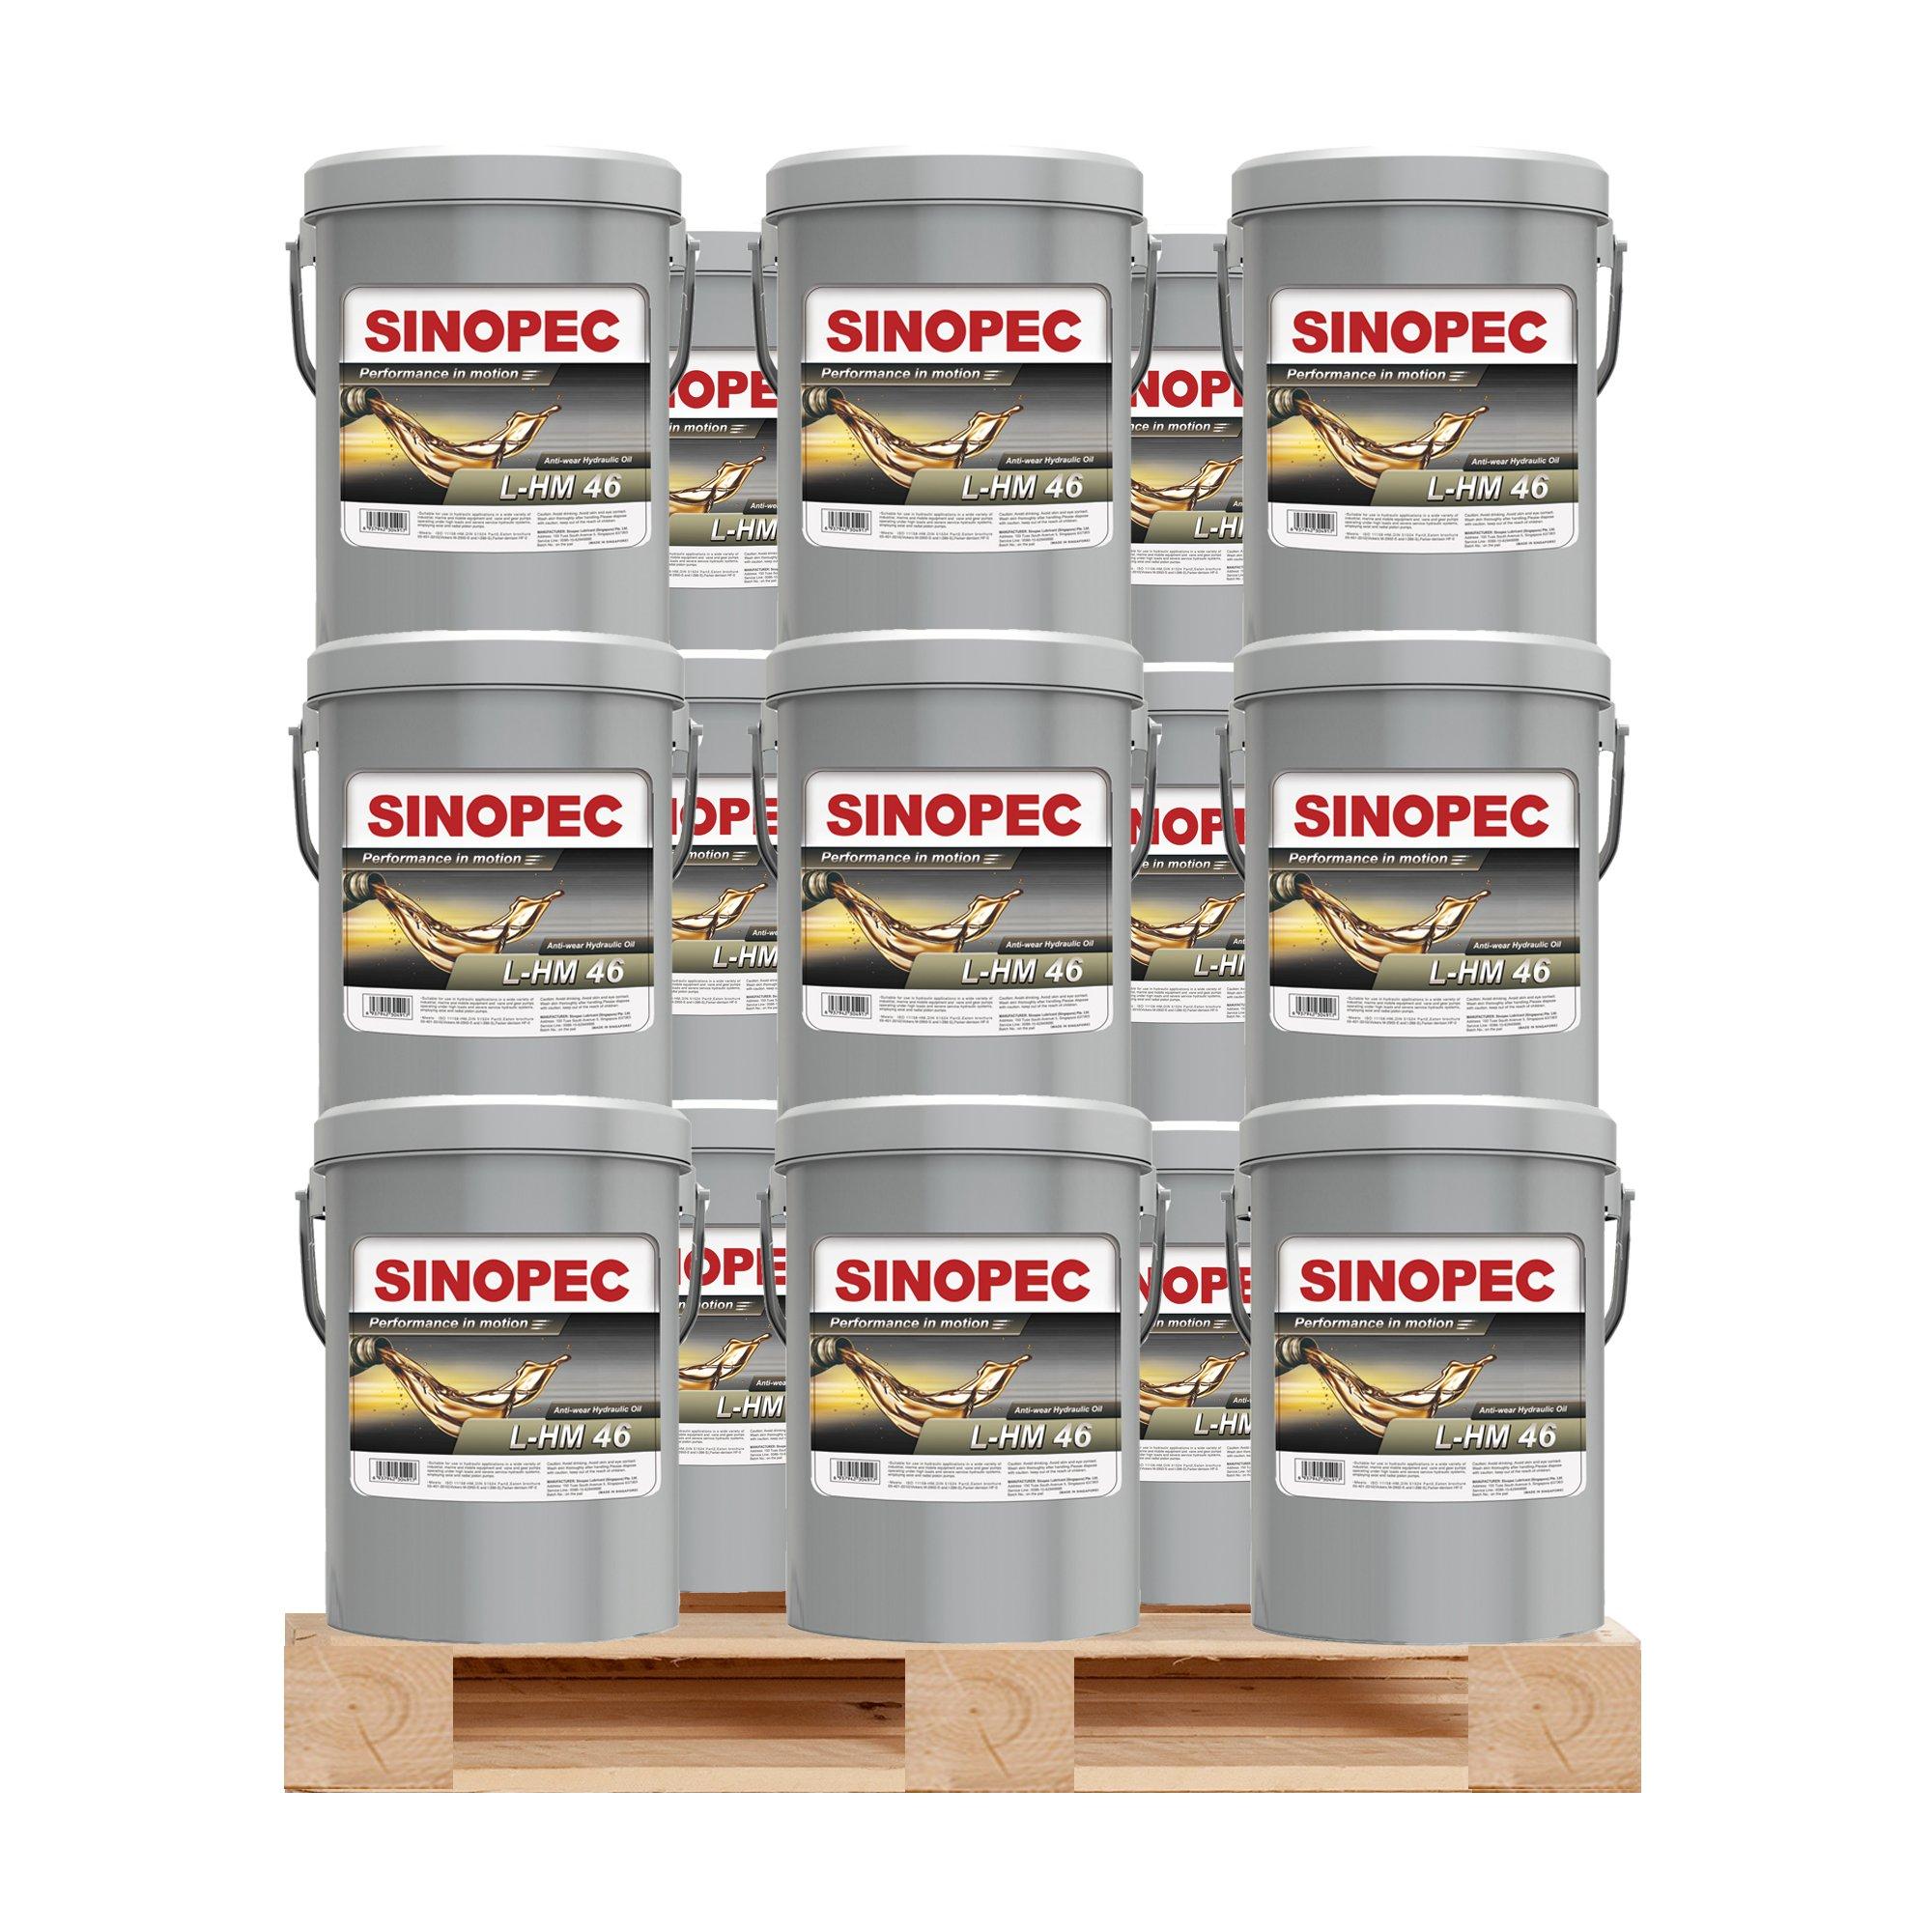 $28 Each - AW 46 Hydraulic Oil Fluid (ISO VG 46, SAE 15) - (36) 5 Gallon Pail (36) by Sinopec